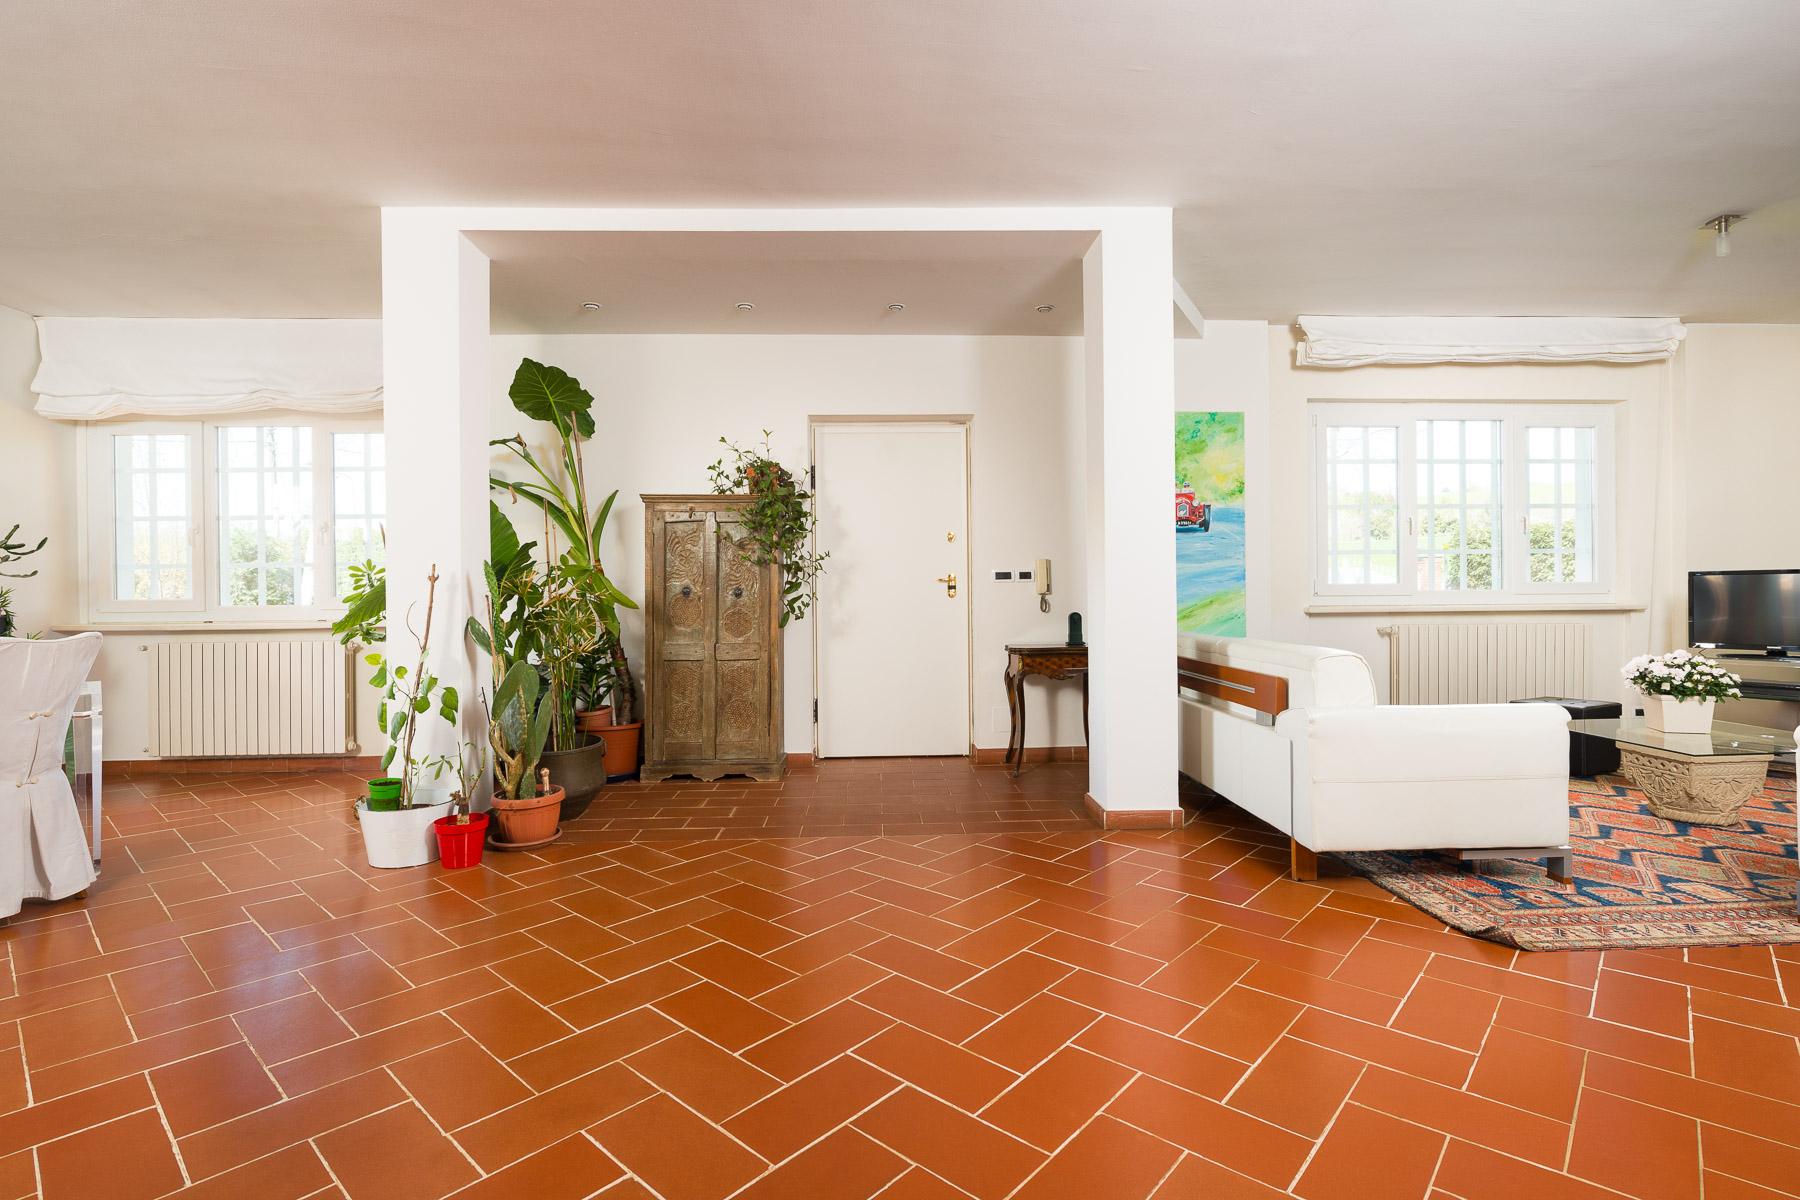 Villa in Vendita a Pino Torinese: 5 locali, 350 mq - Foto 2